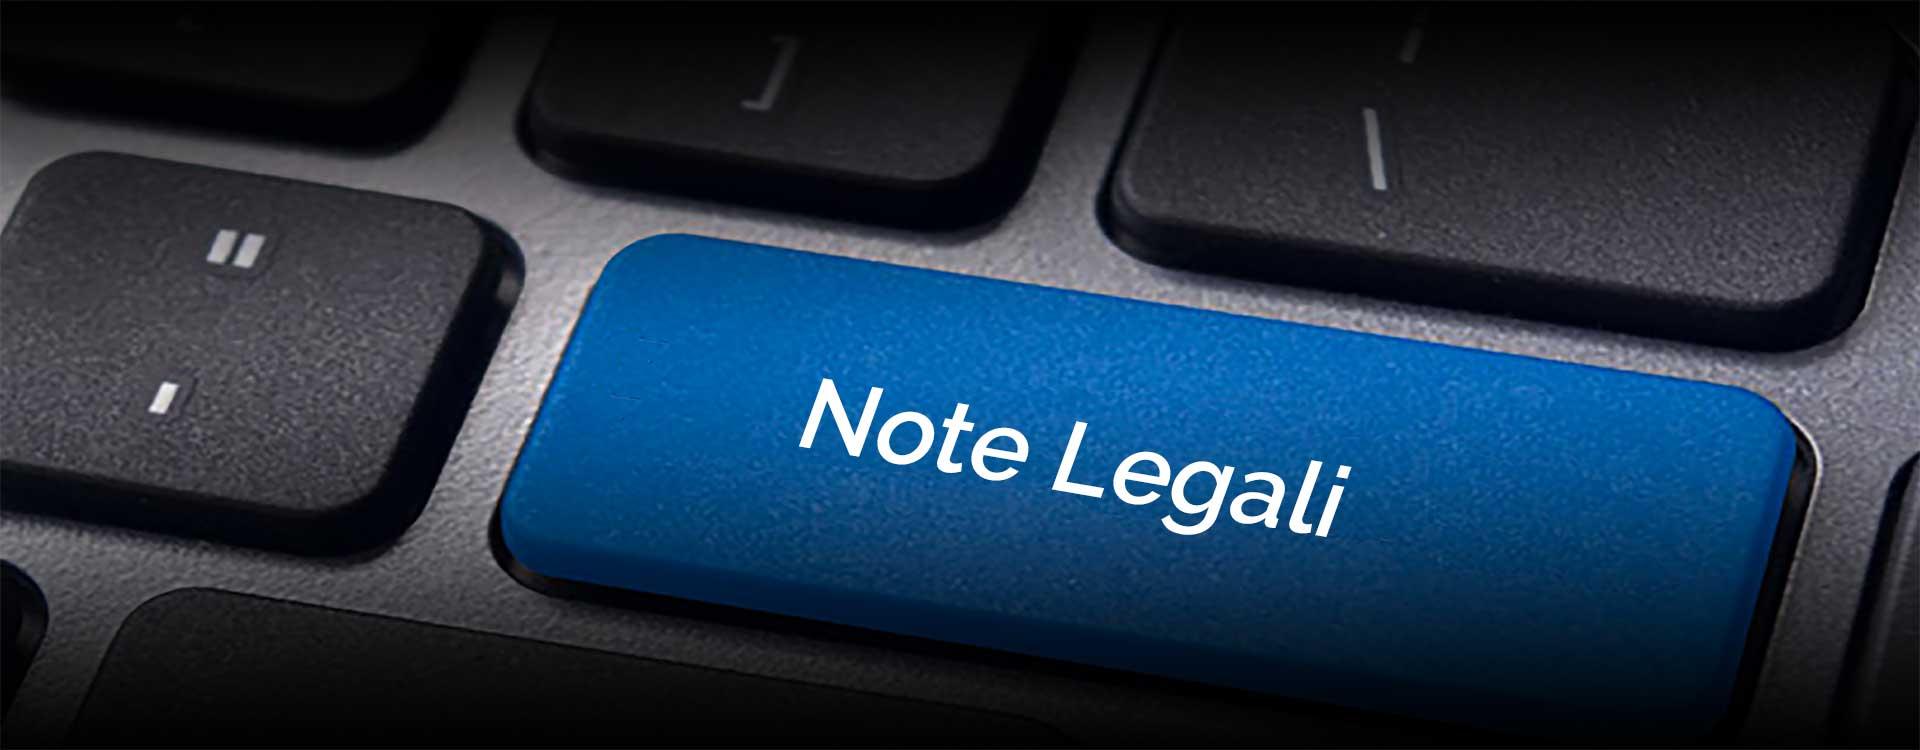 Slider_note-legali_1920